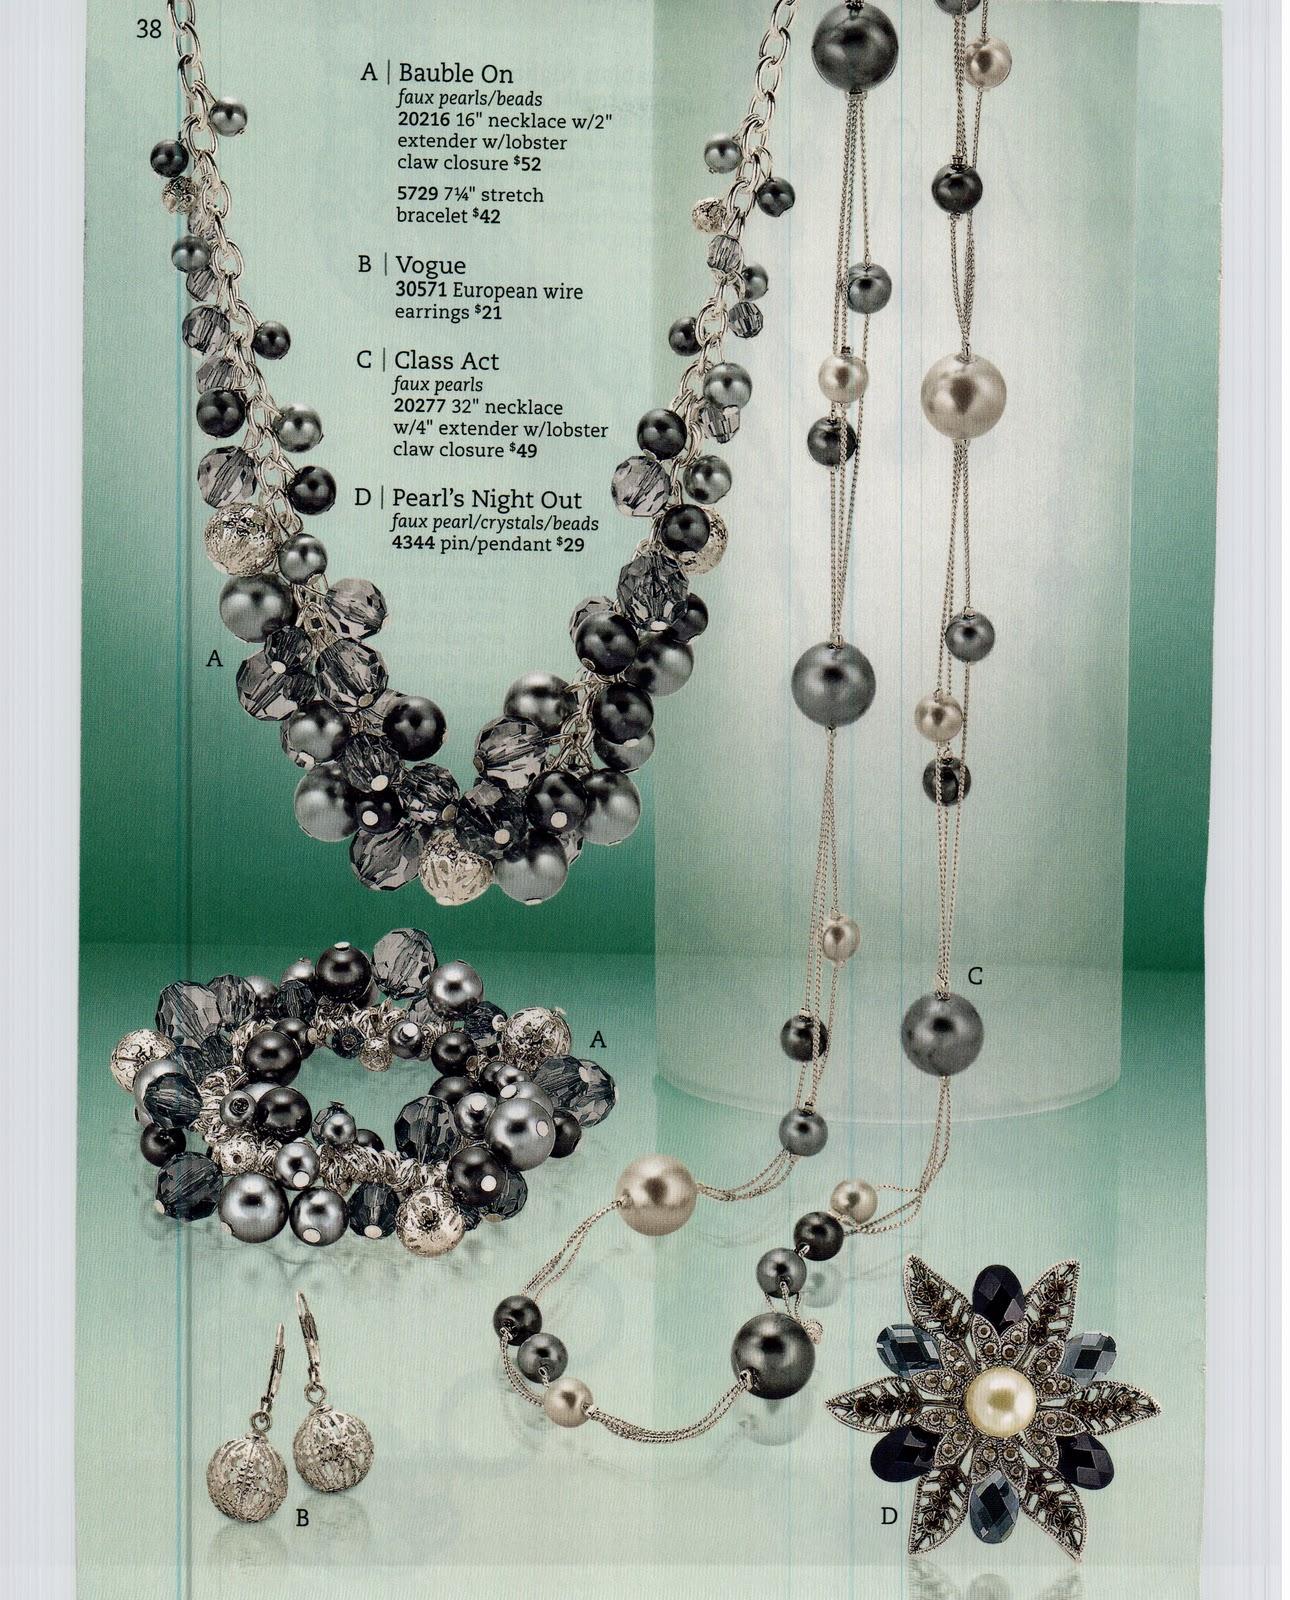 Premier designs for Premier designs jewelry images